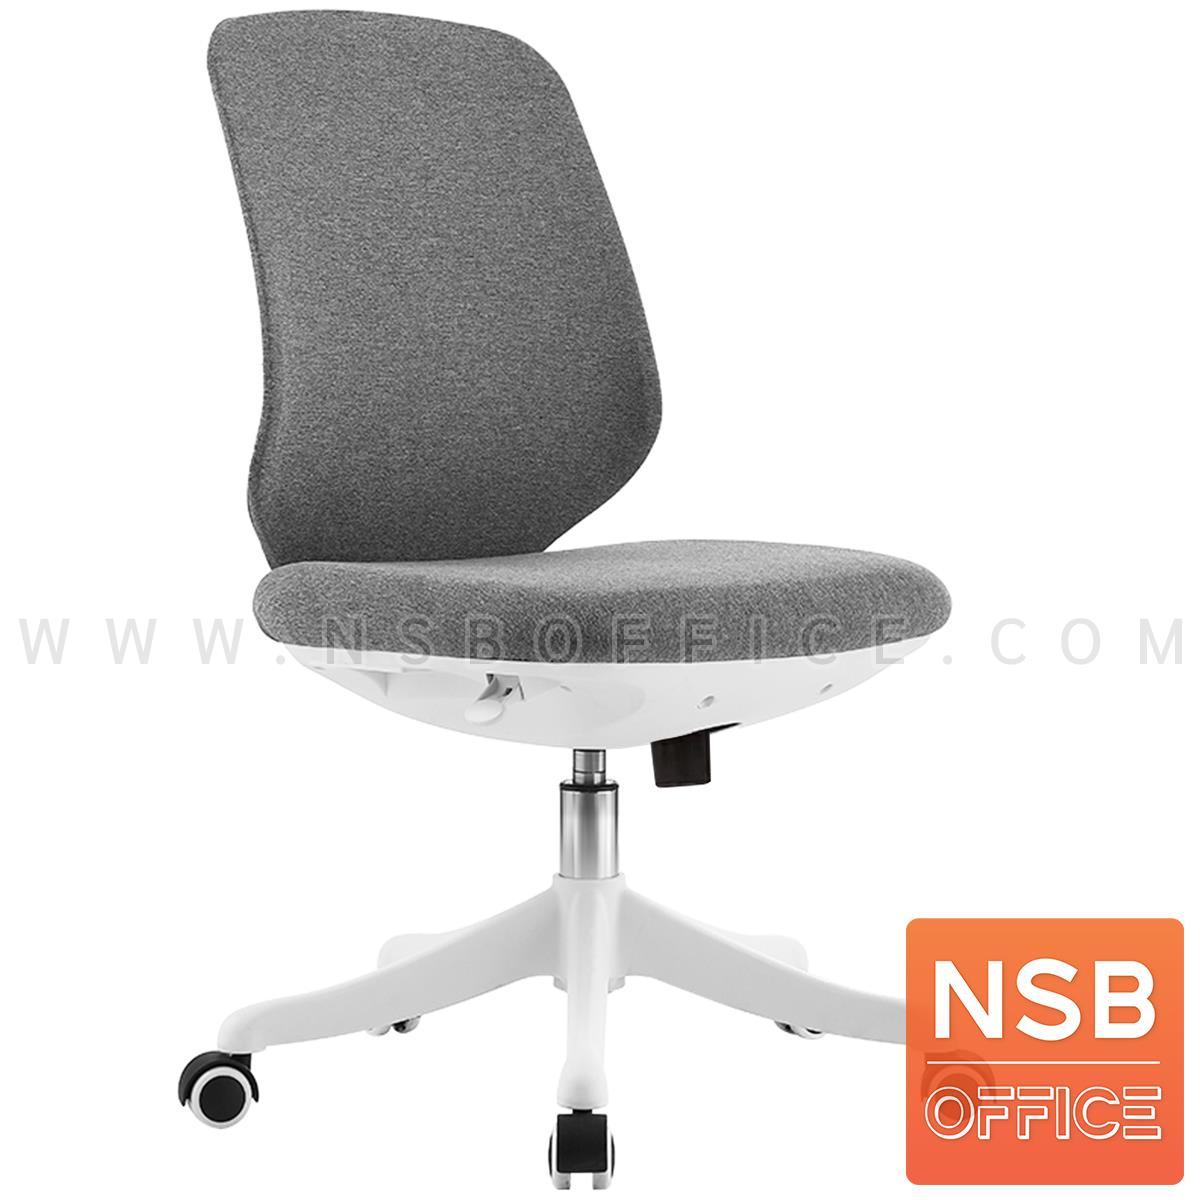 B33A013:เก้าอี้สำนักงาน รุ่น Olympe (โอแล็มป์)  ไม่มีท้าวแขน ขาพลาสติก